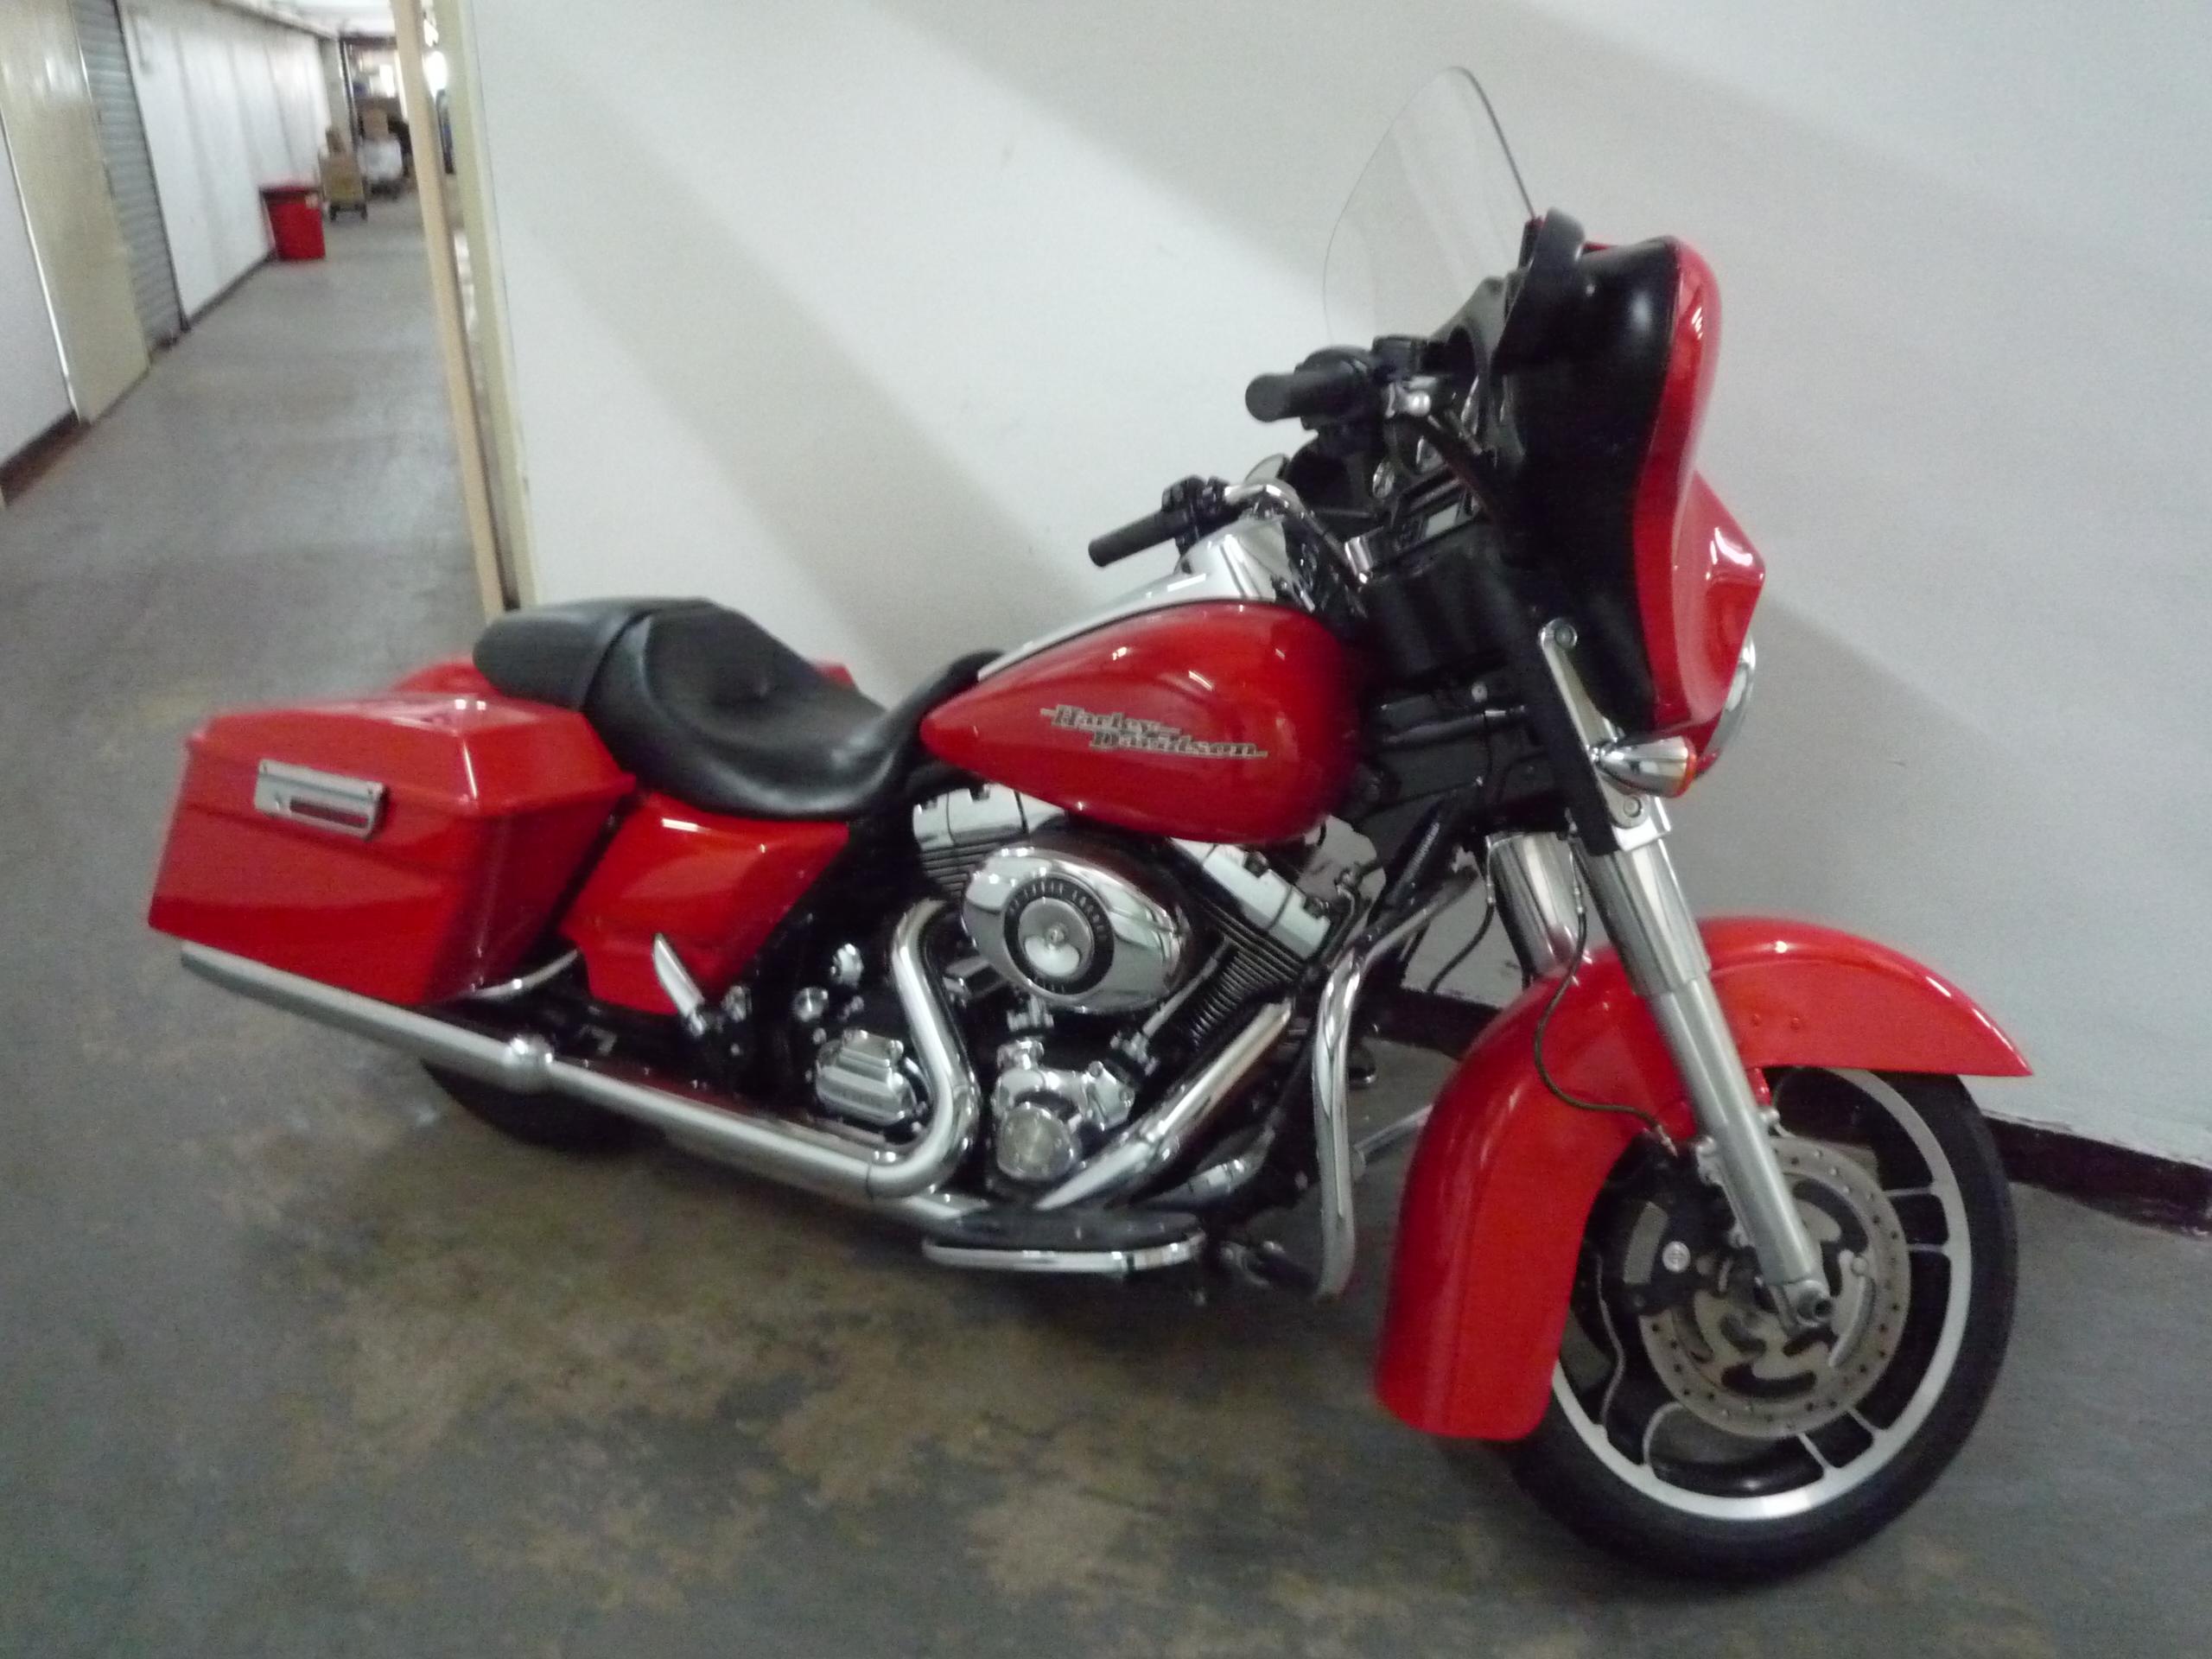 2012 Harley Davidson Flhx Street Glide Sold Motion